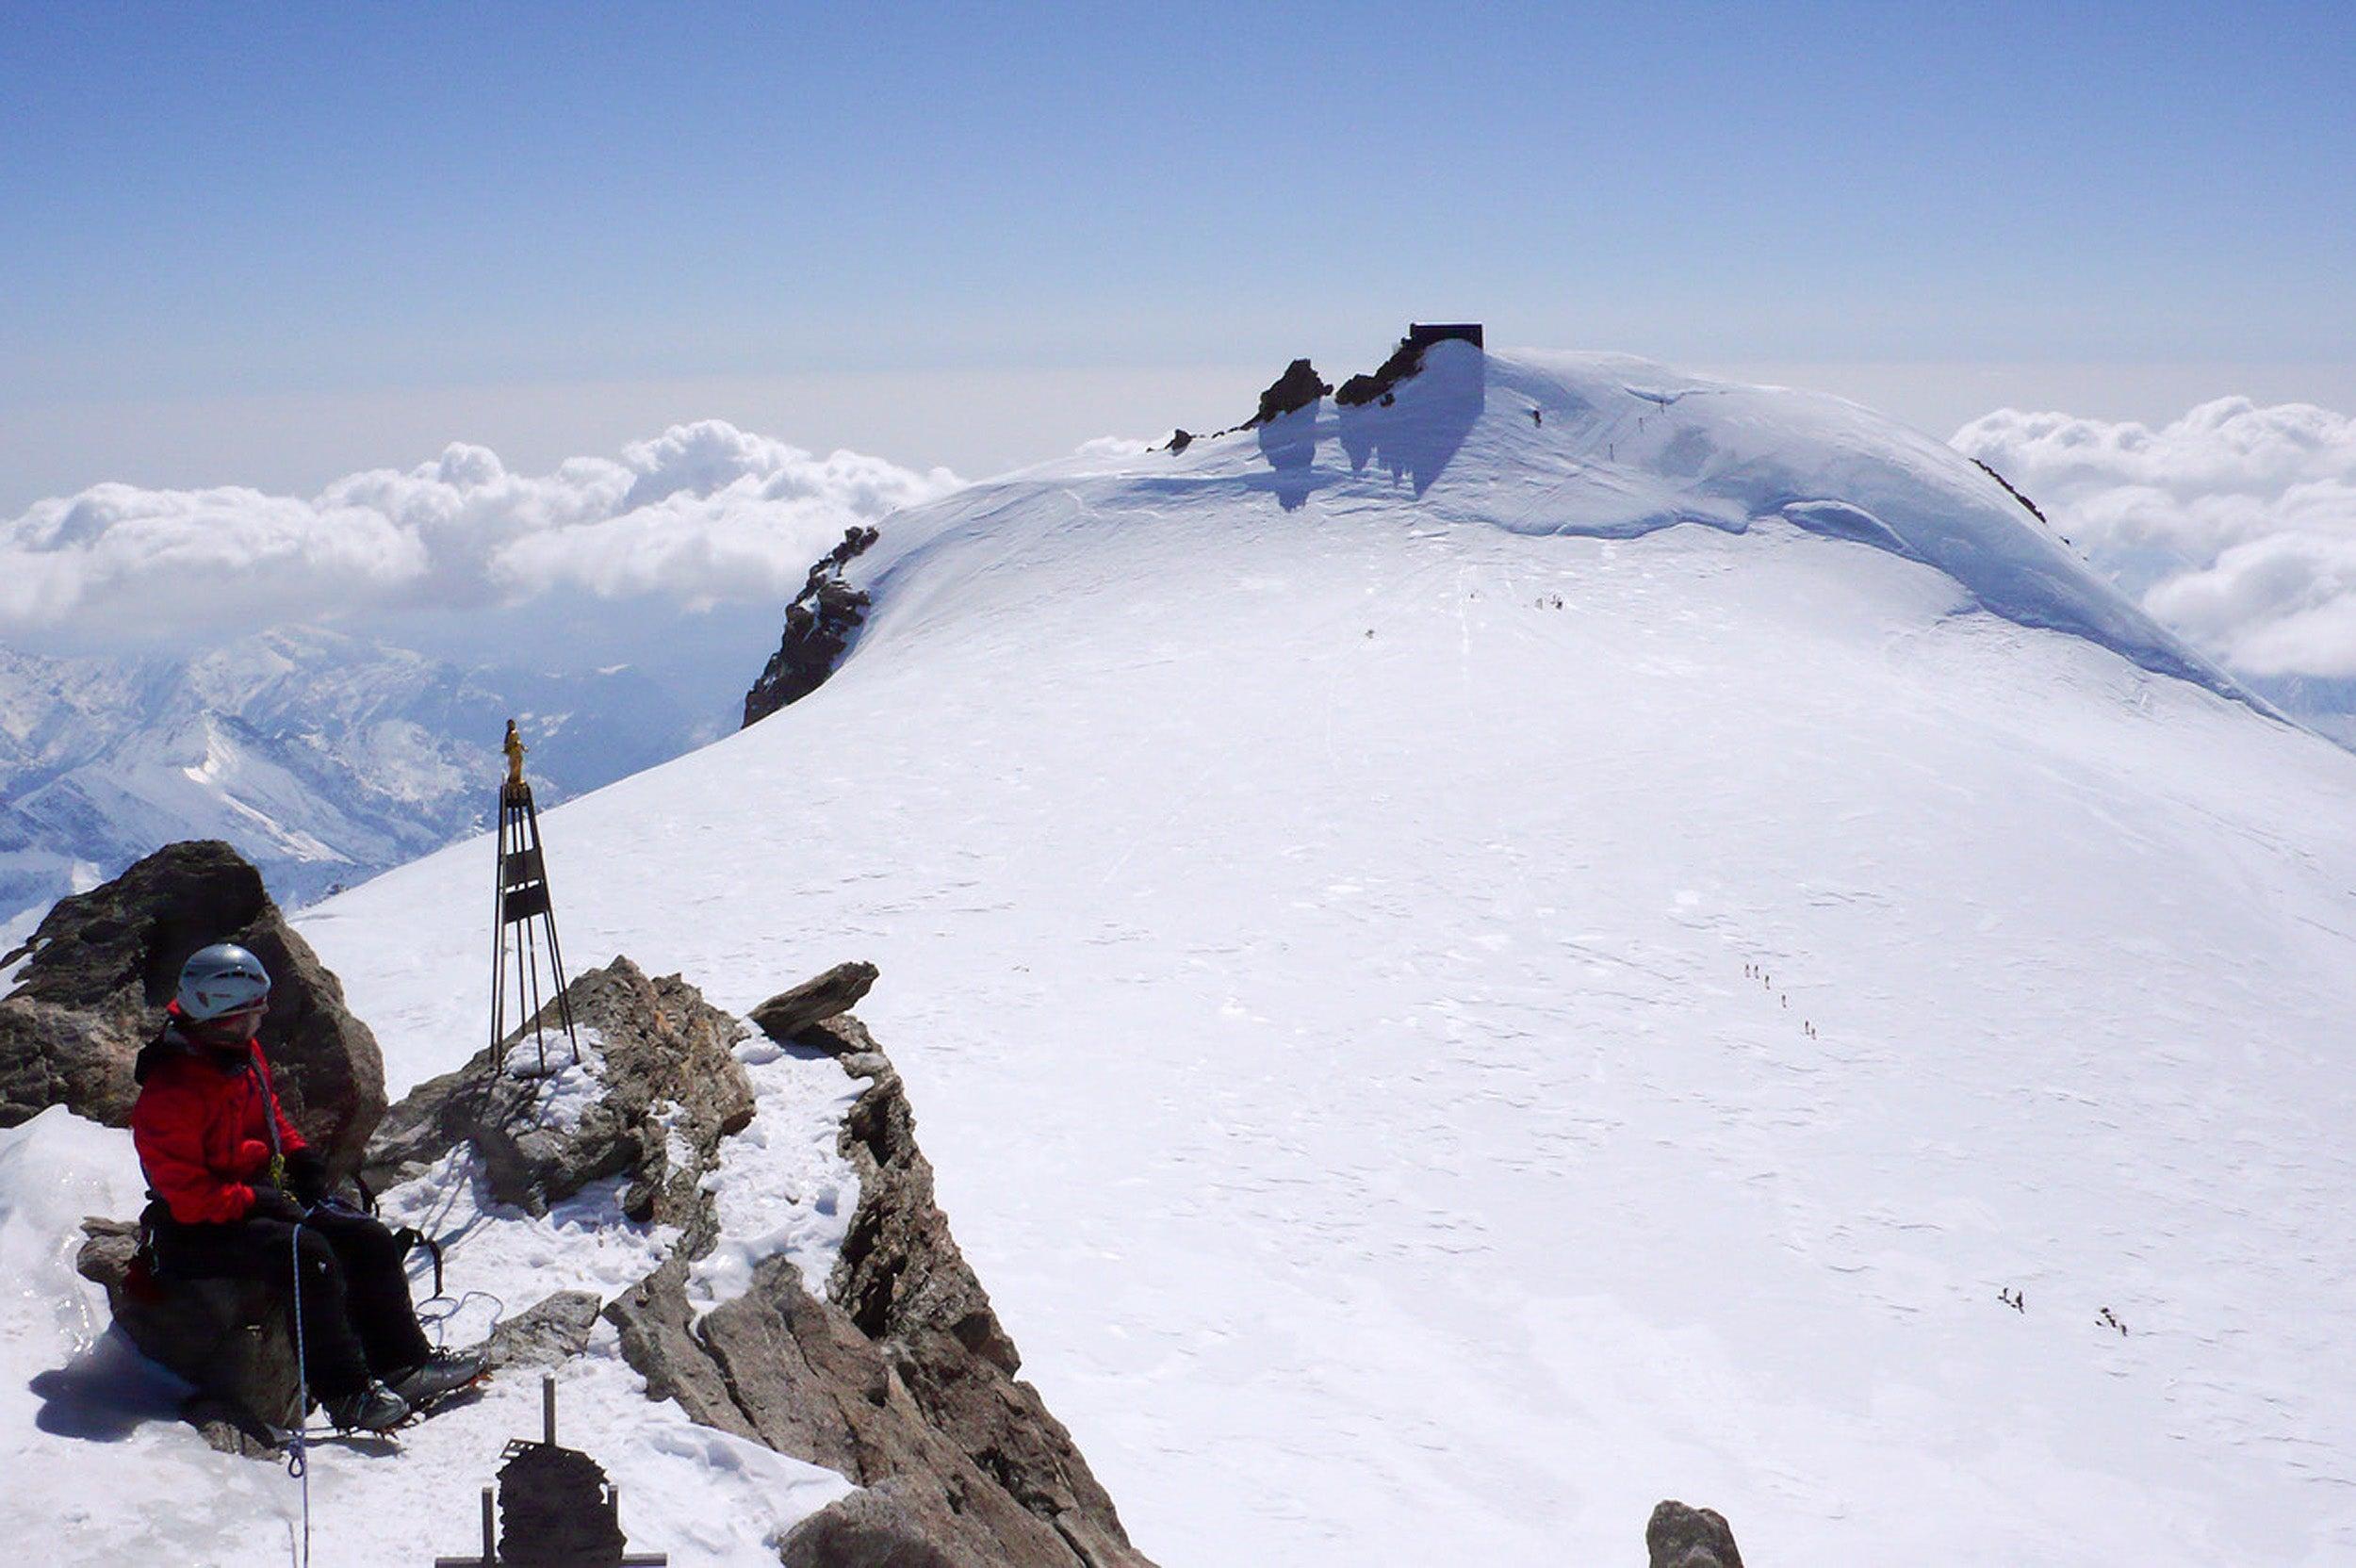 Ice on a mountain.